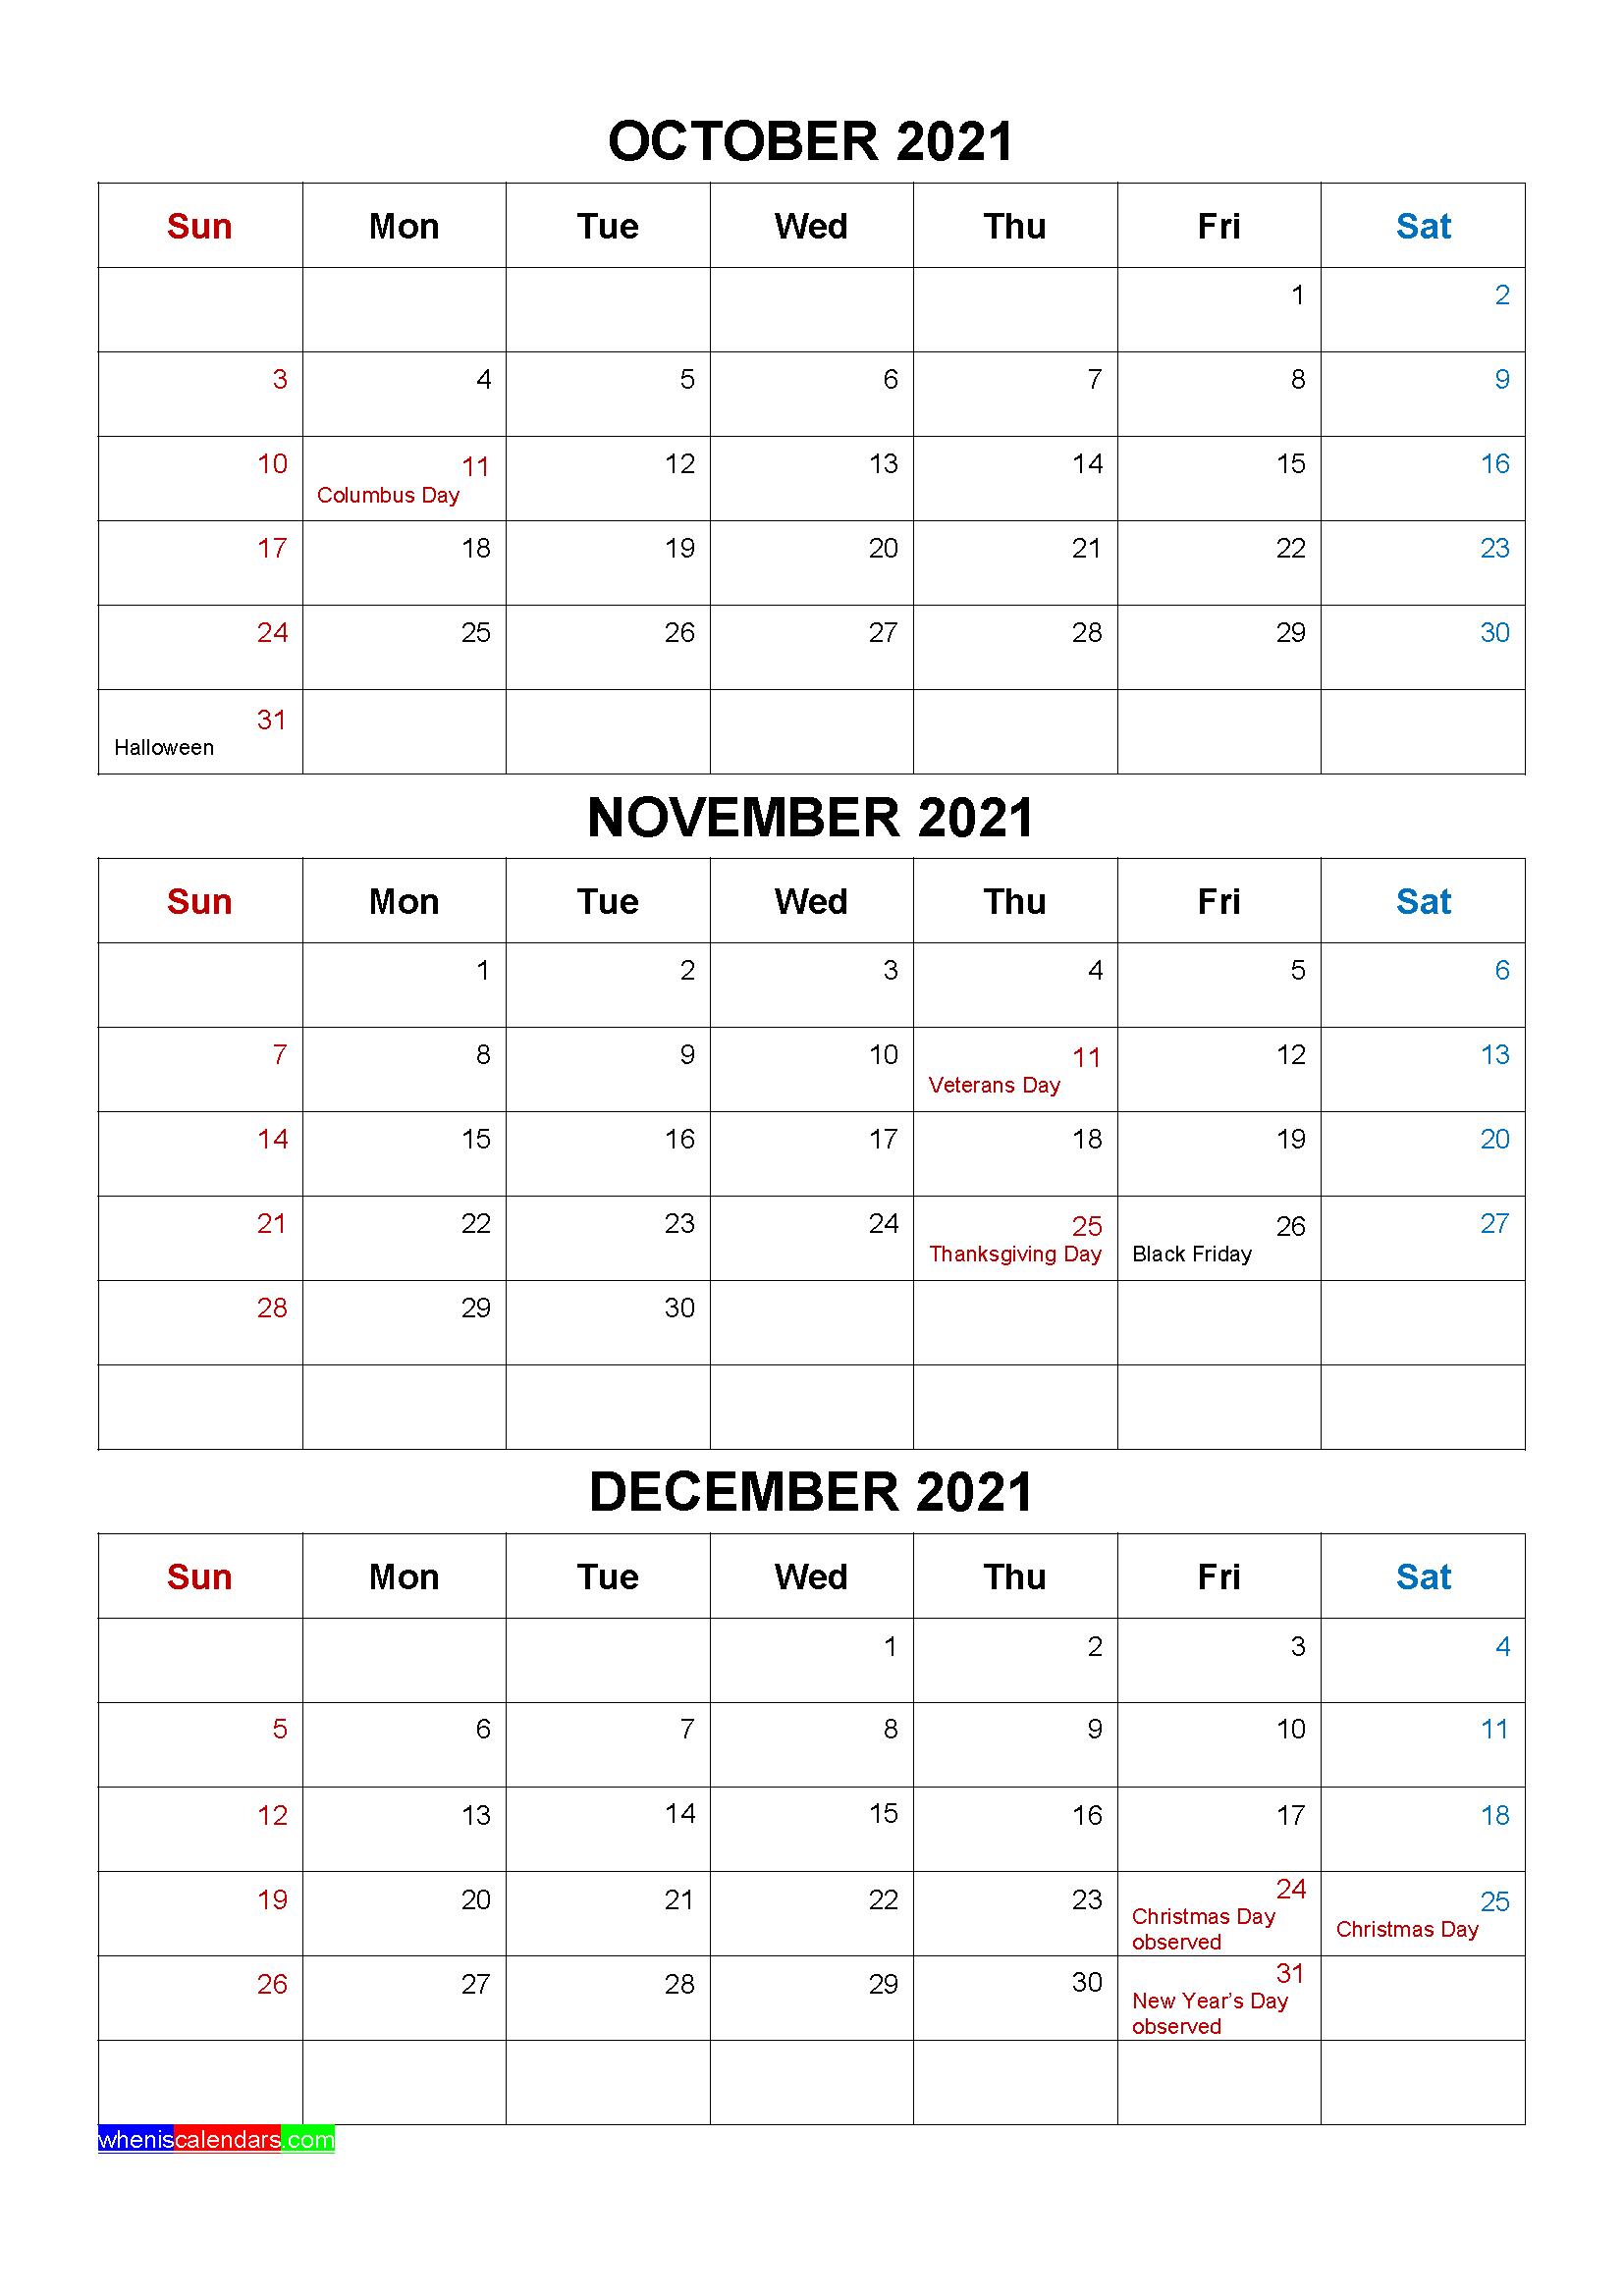 Free October November December 2021 Calendar with Holidays